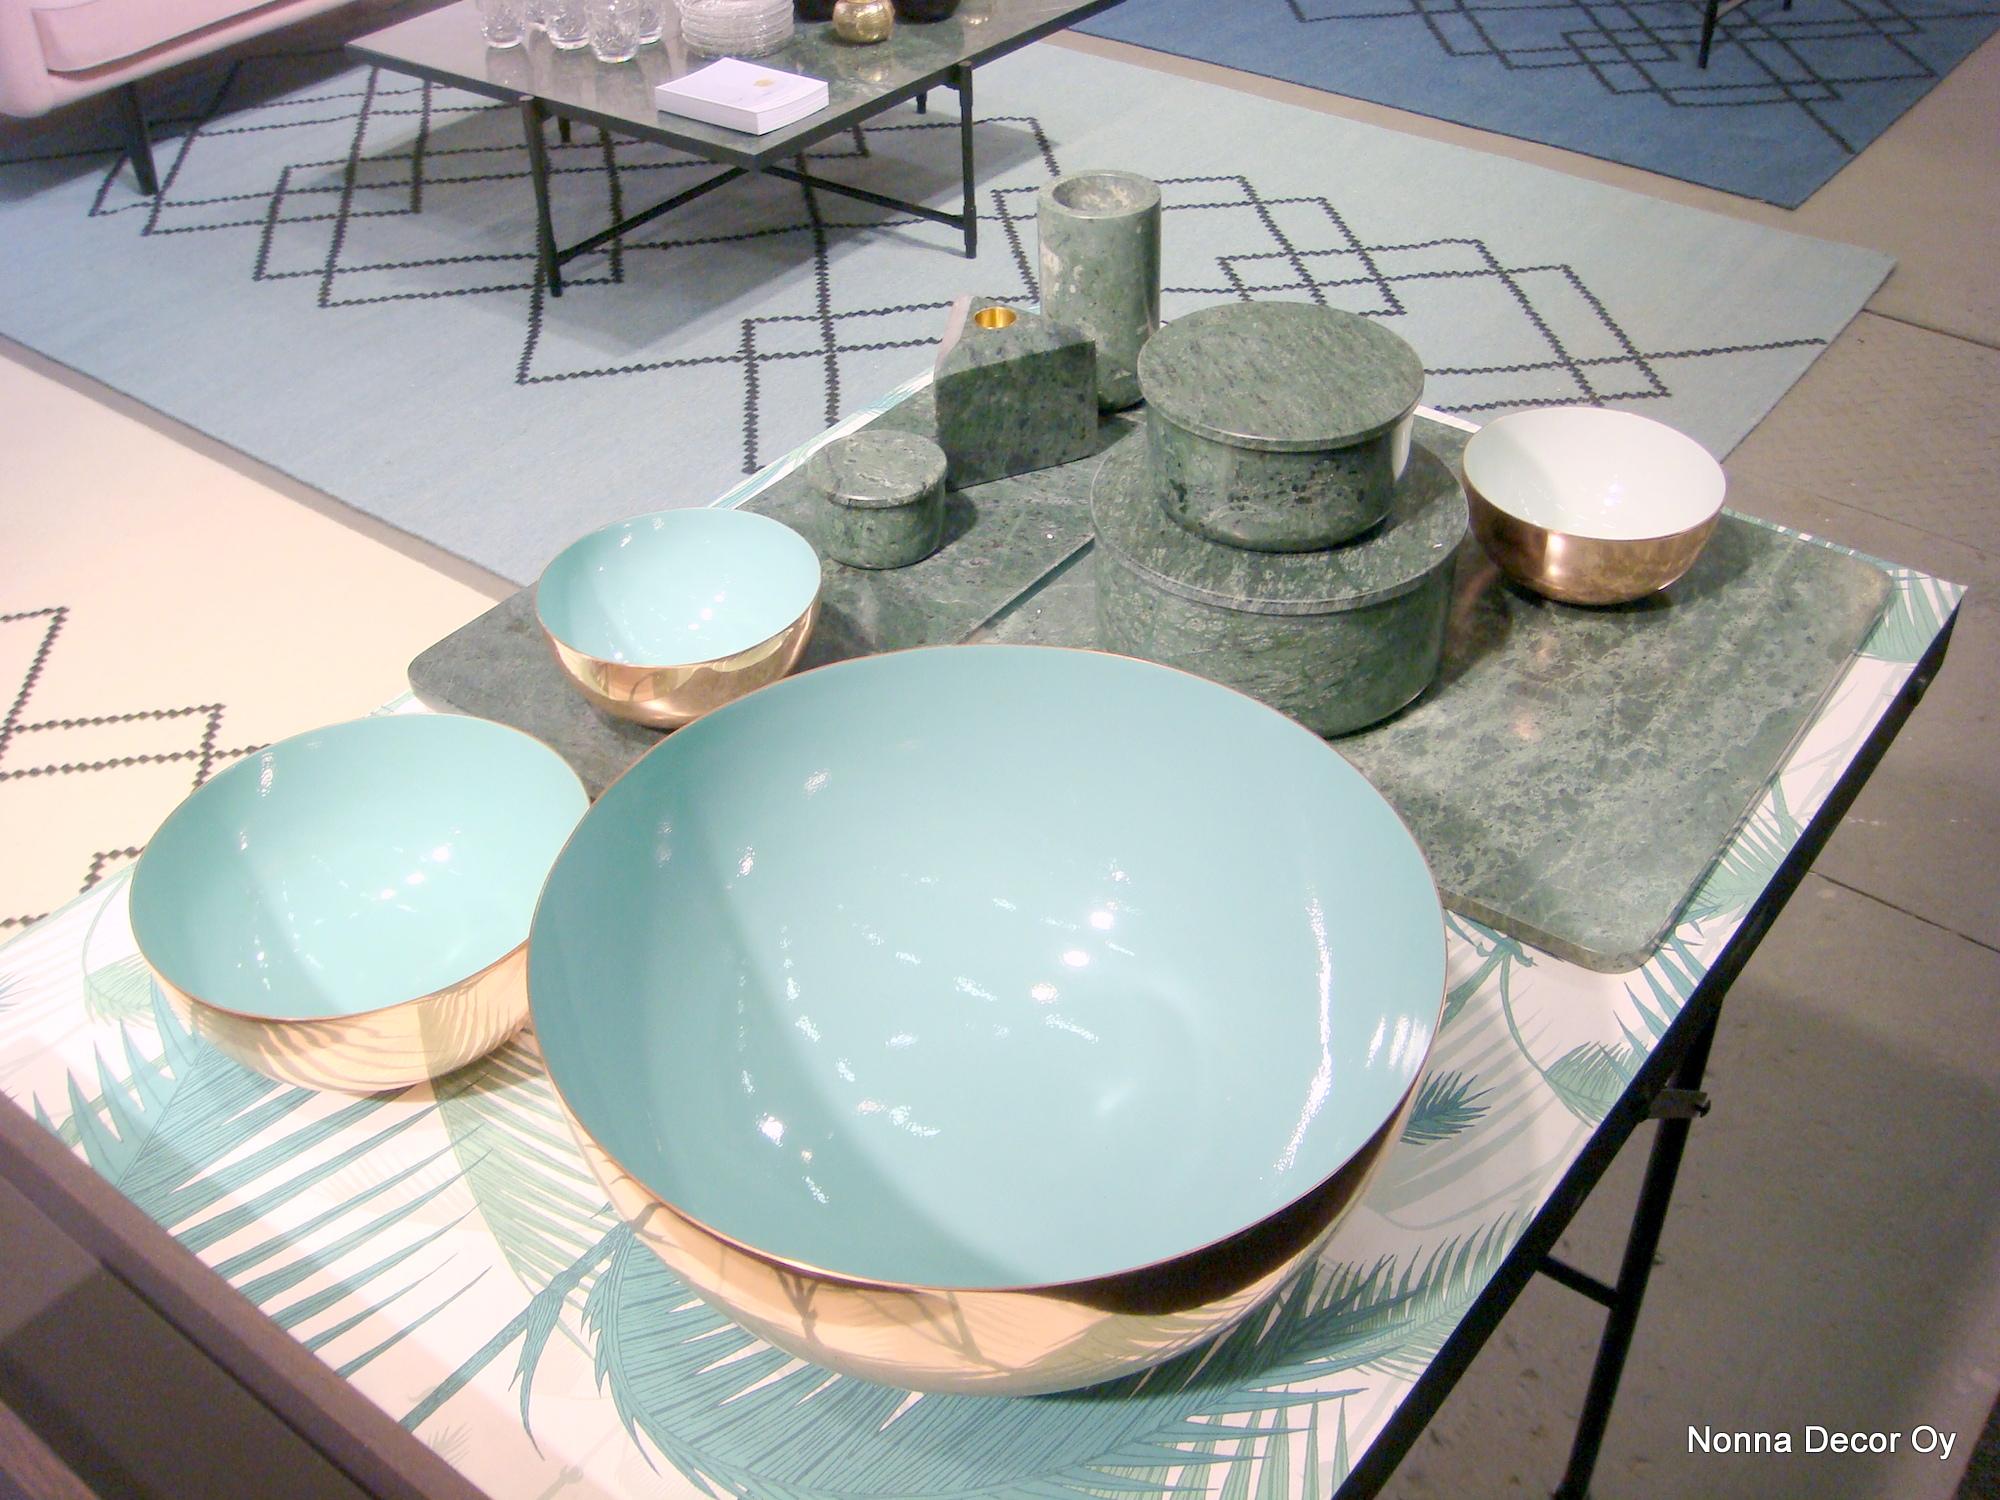 1-Stockholma furniture and light 2016 025